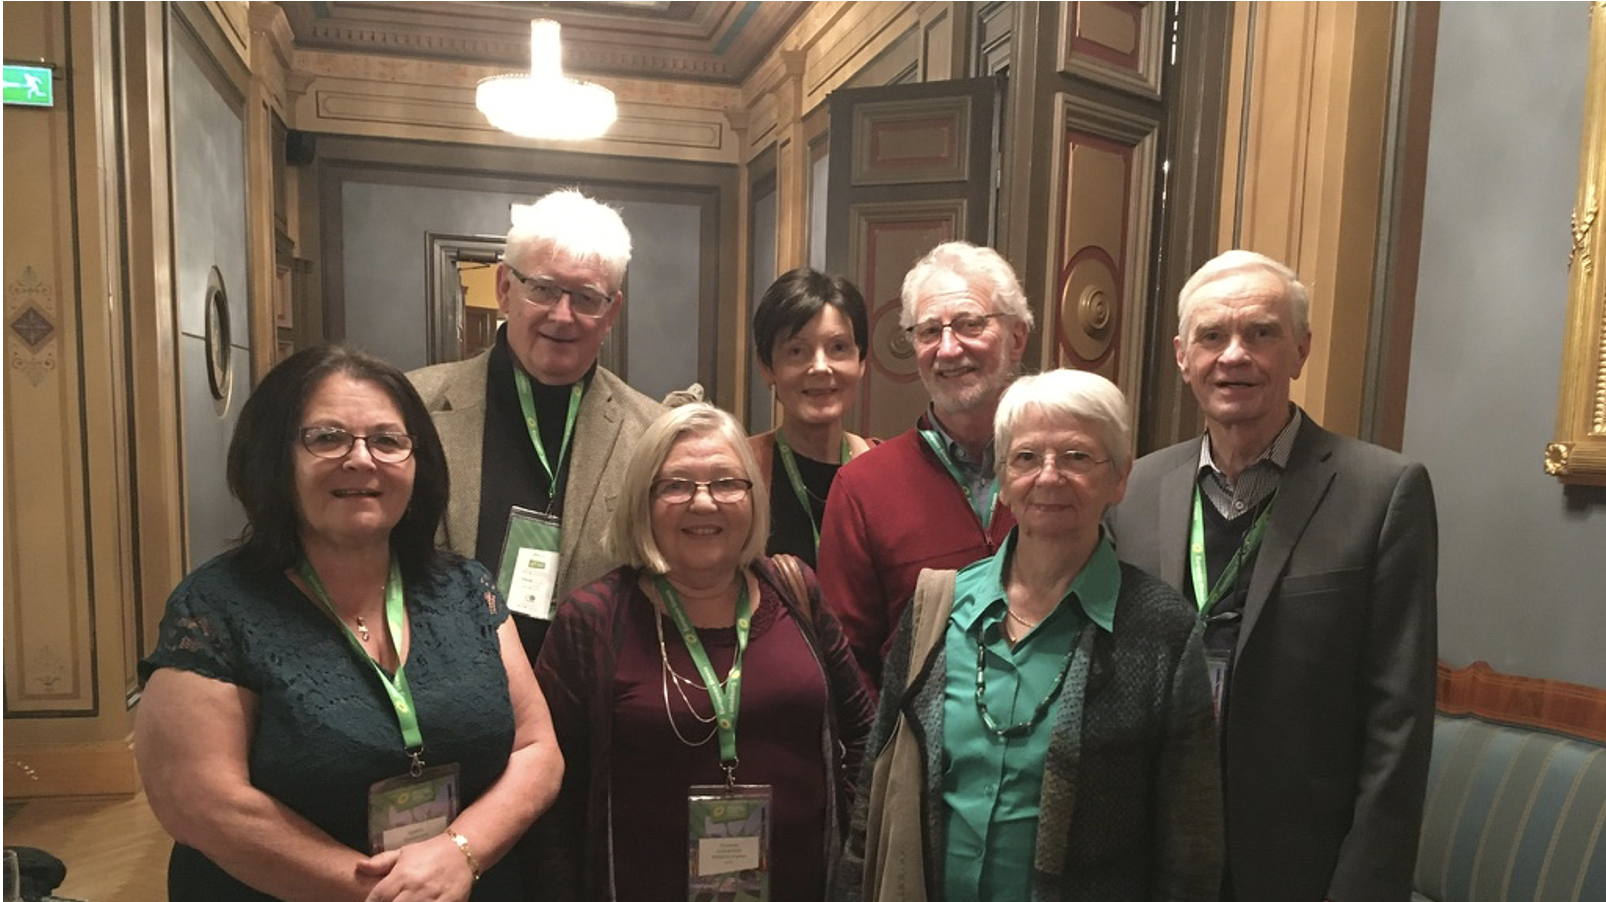 ENGS delegation in Tampere 19 November 2019. From left: Agneta Granström, Frank Hauser, Vivianne Gunnarsson, Heidi Manns-Haatanen, Kris Fierens, Irmgard Seidler and Reino Lampinen.